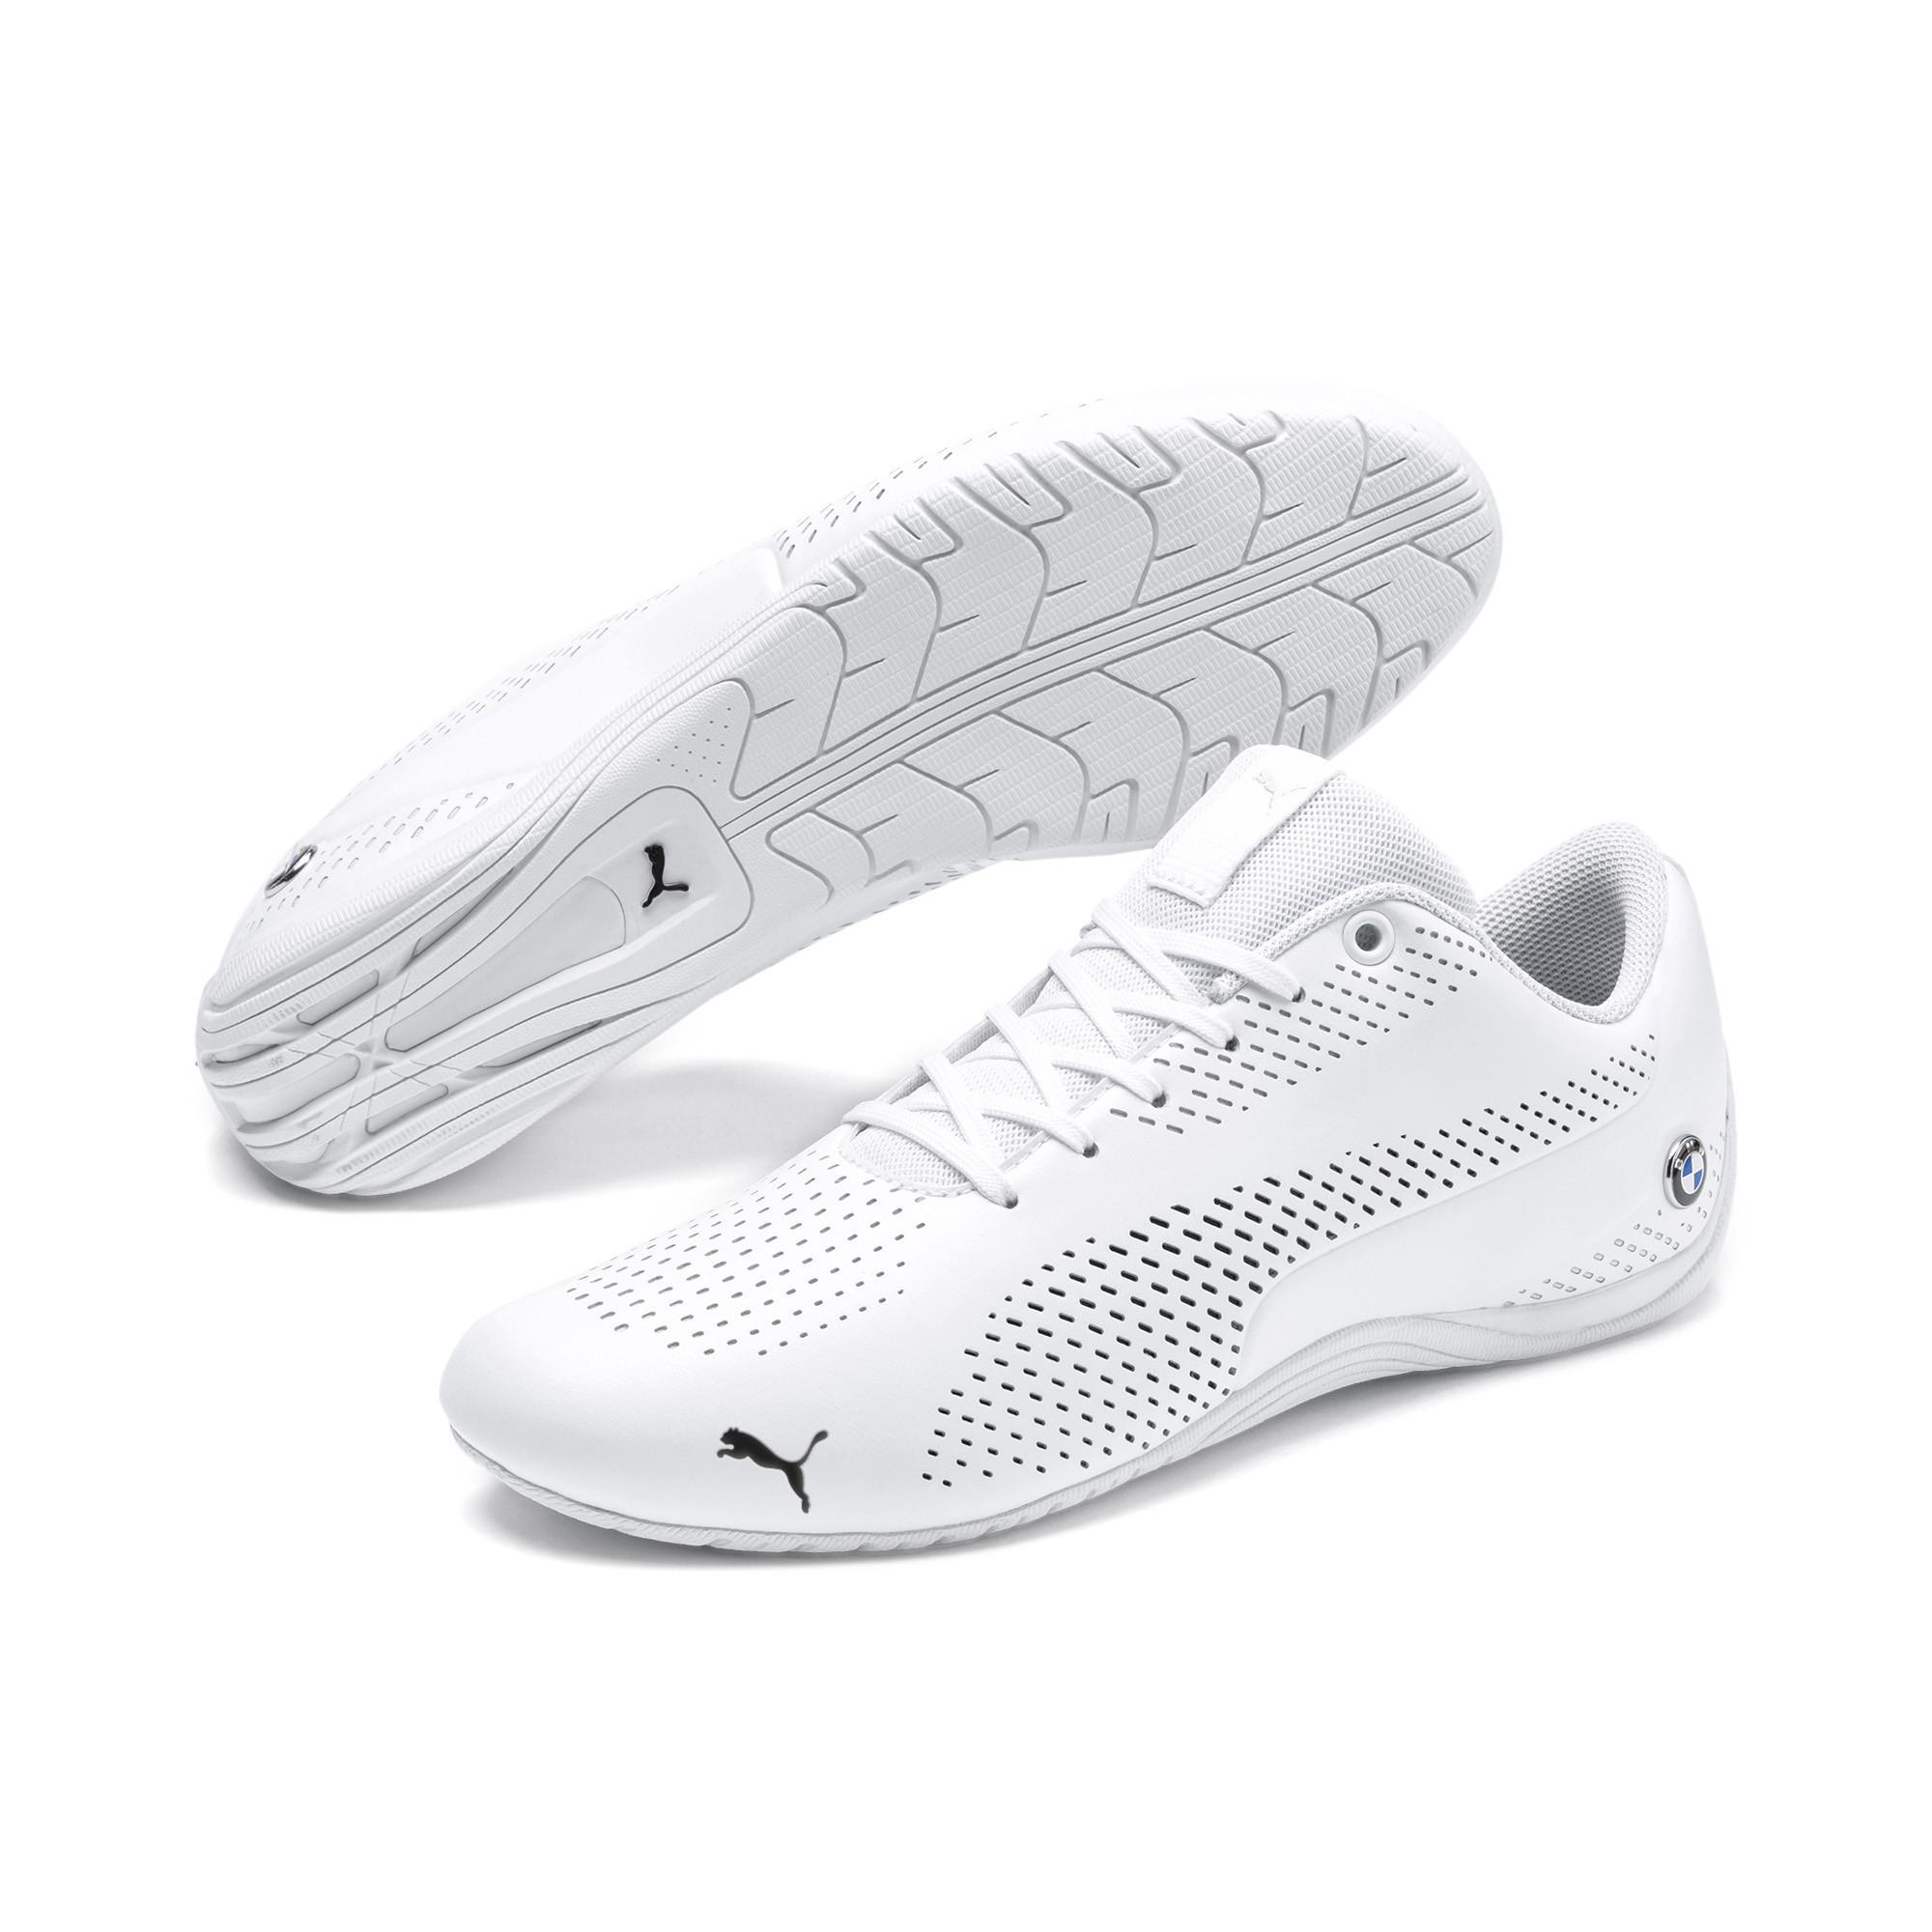 a88a1d0451704e PUMA - White Bmw Mms Drift Cat 5 Ultra Ii Men s Sneakers for Men - Lyst.  View fullscreen